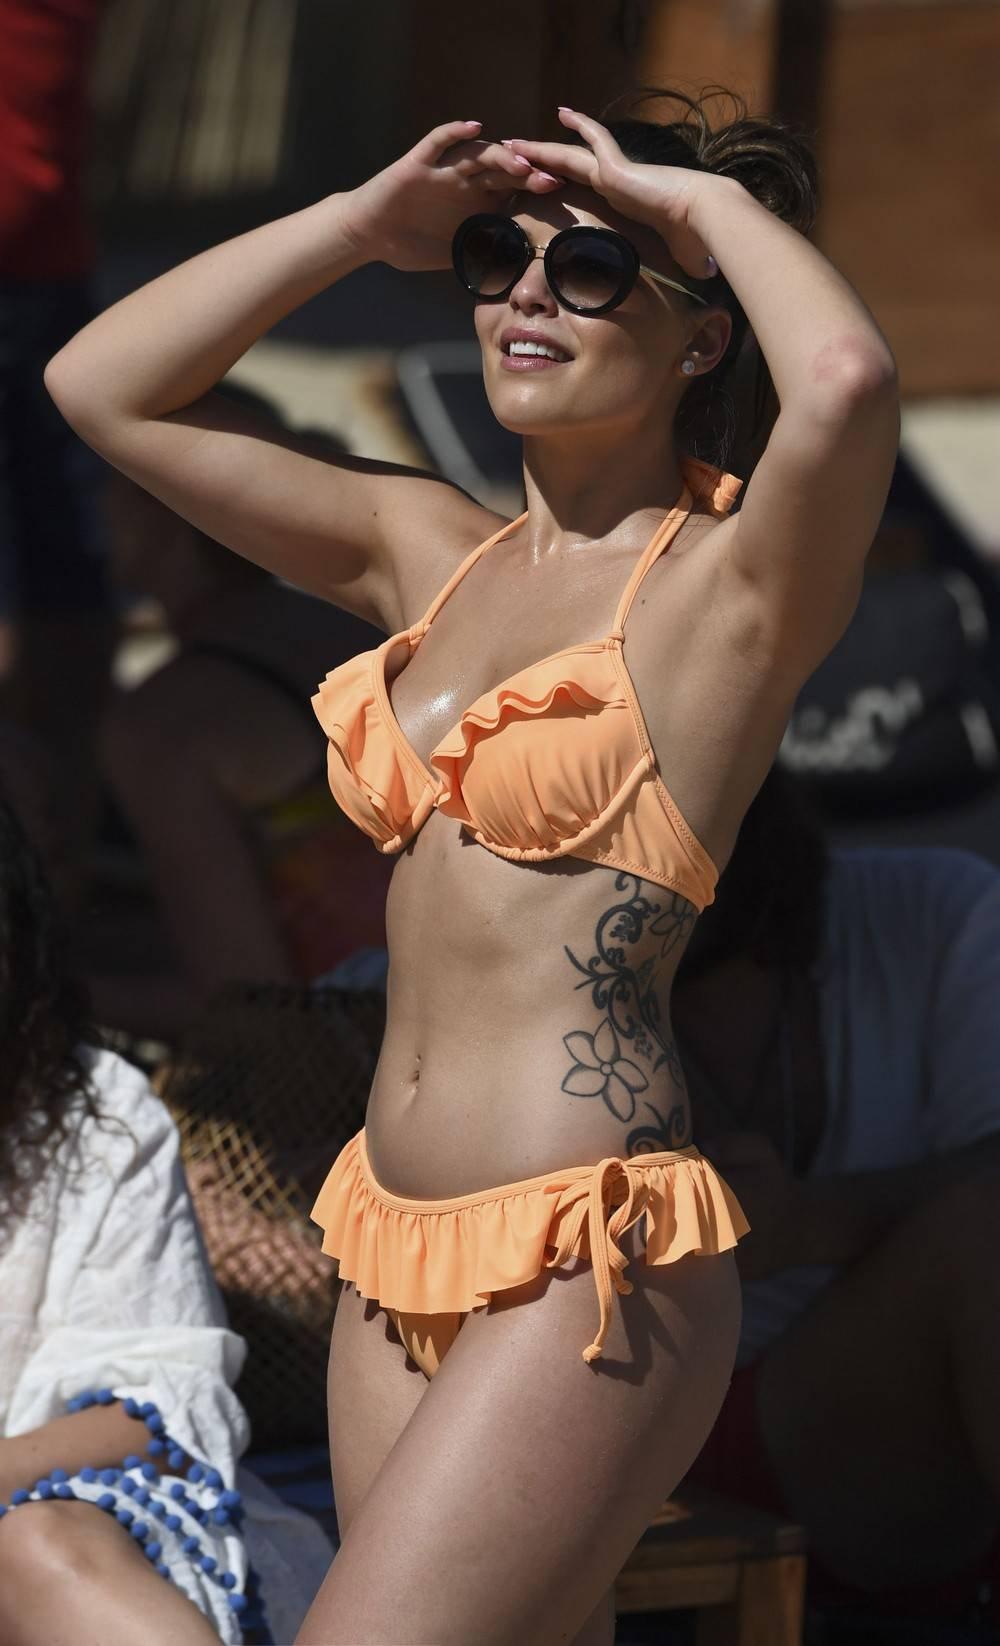 2018 bikini olympia photos Cached